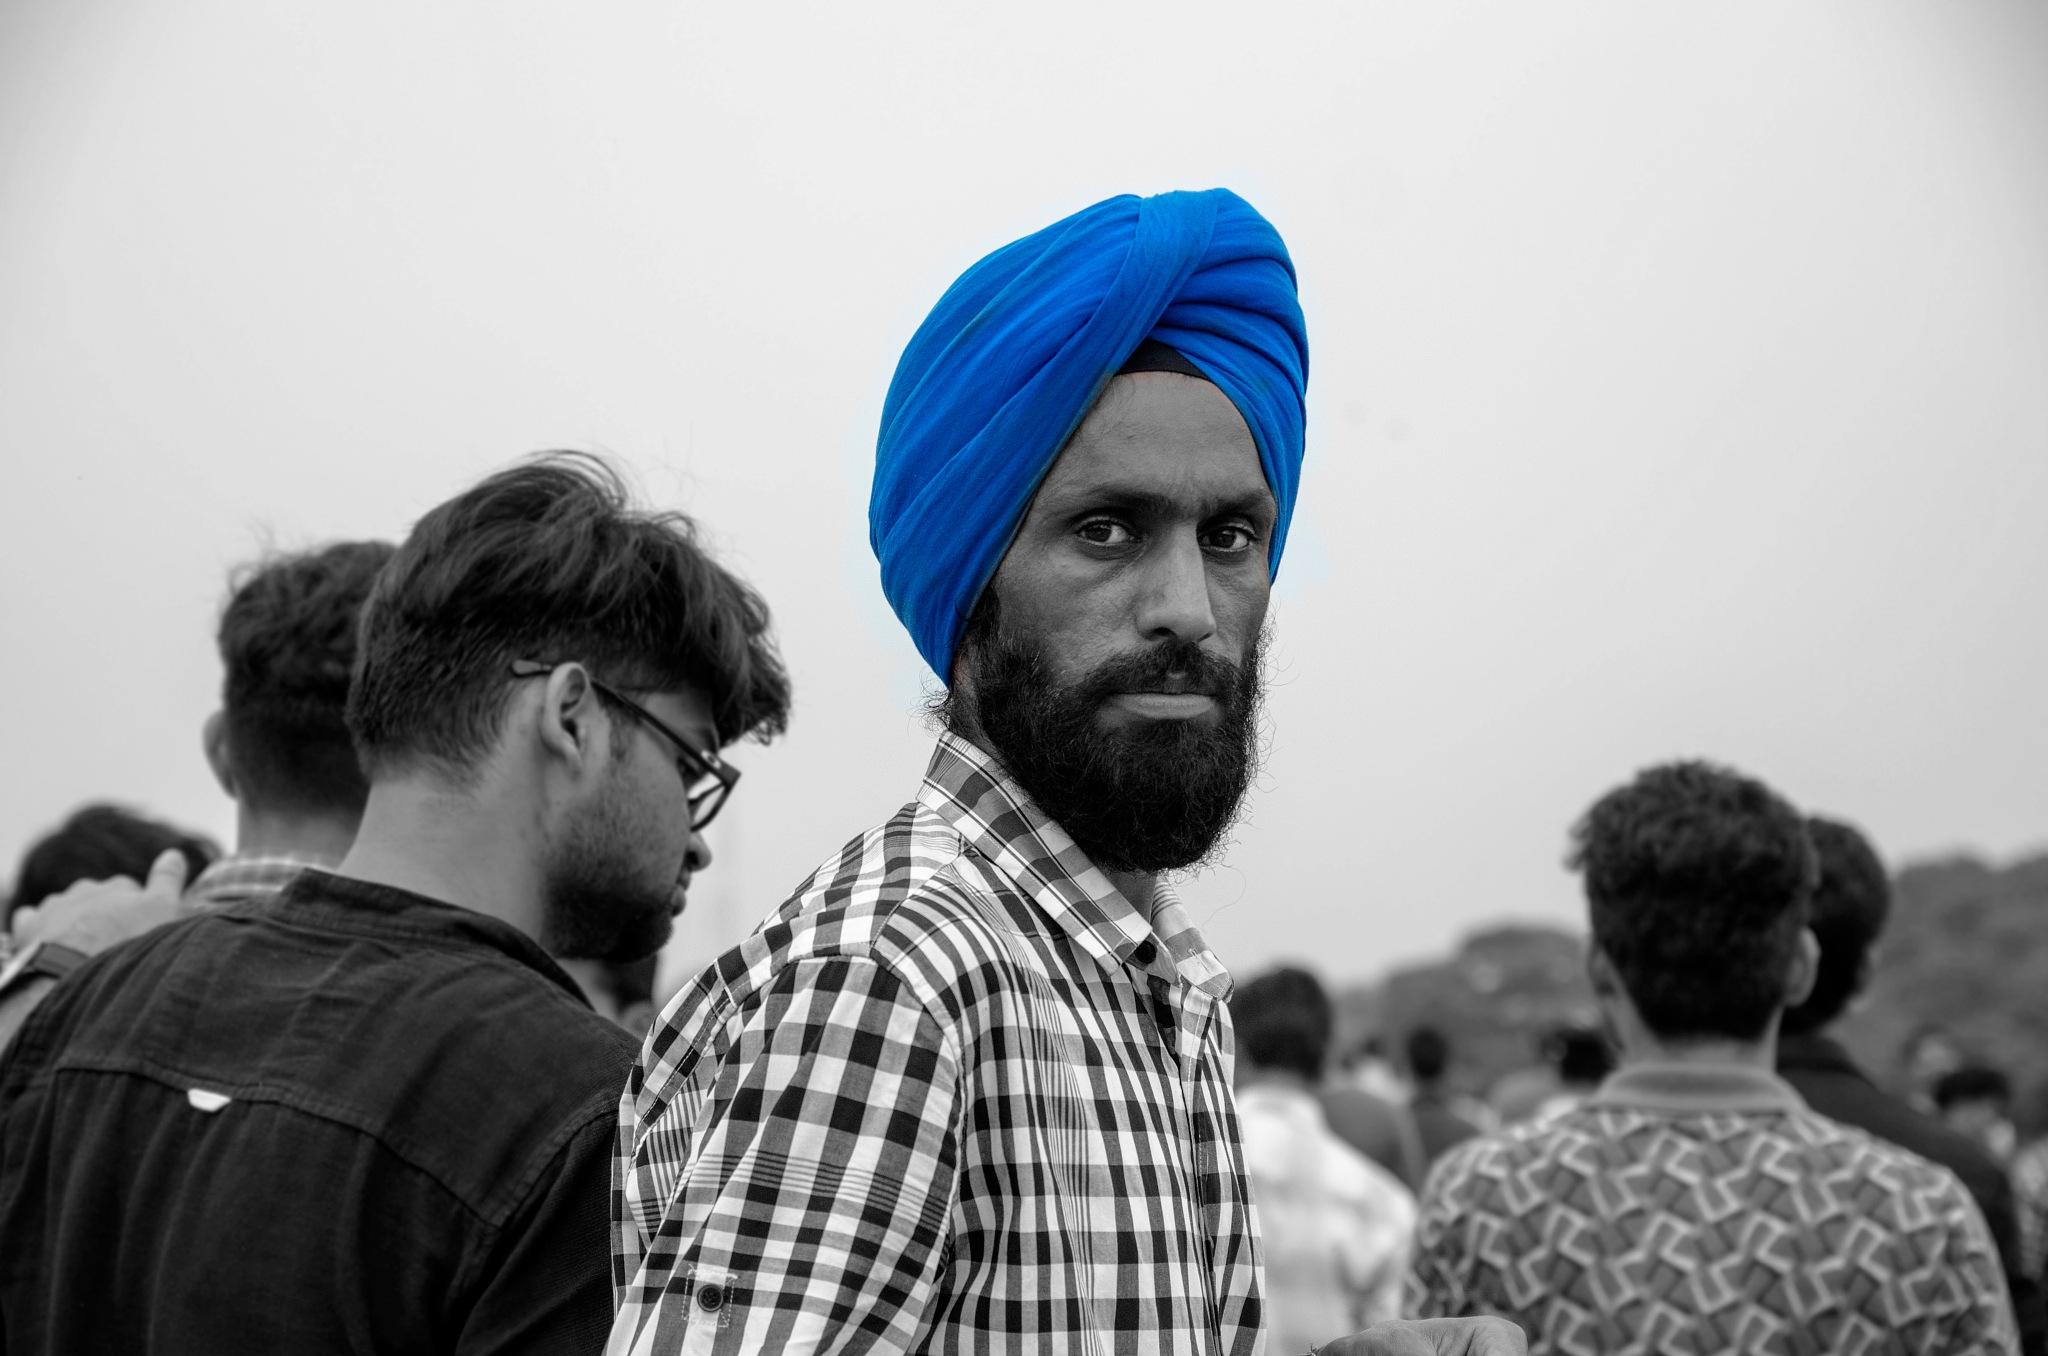 Sikh man in India by marokkyprianou